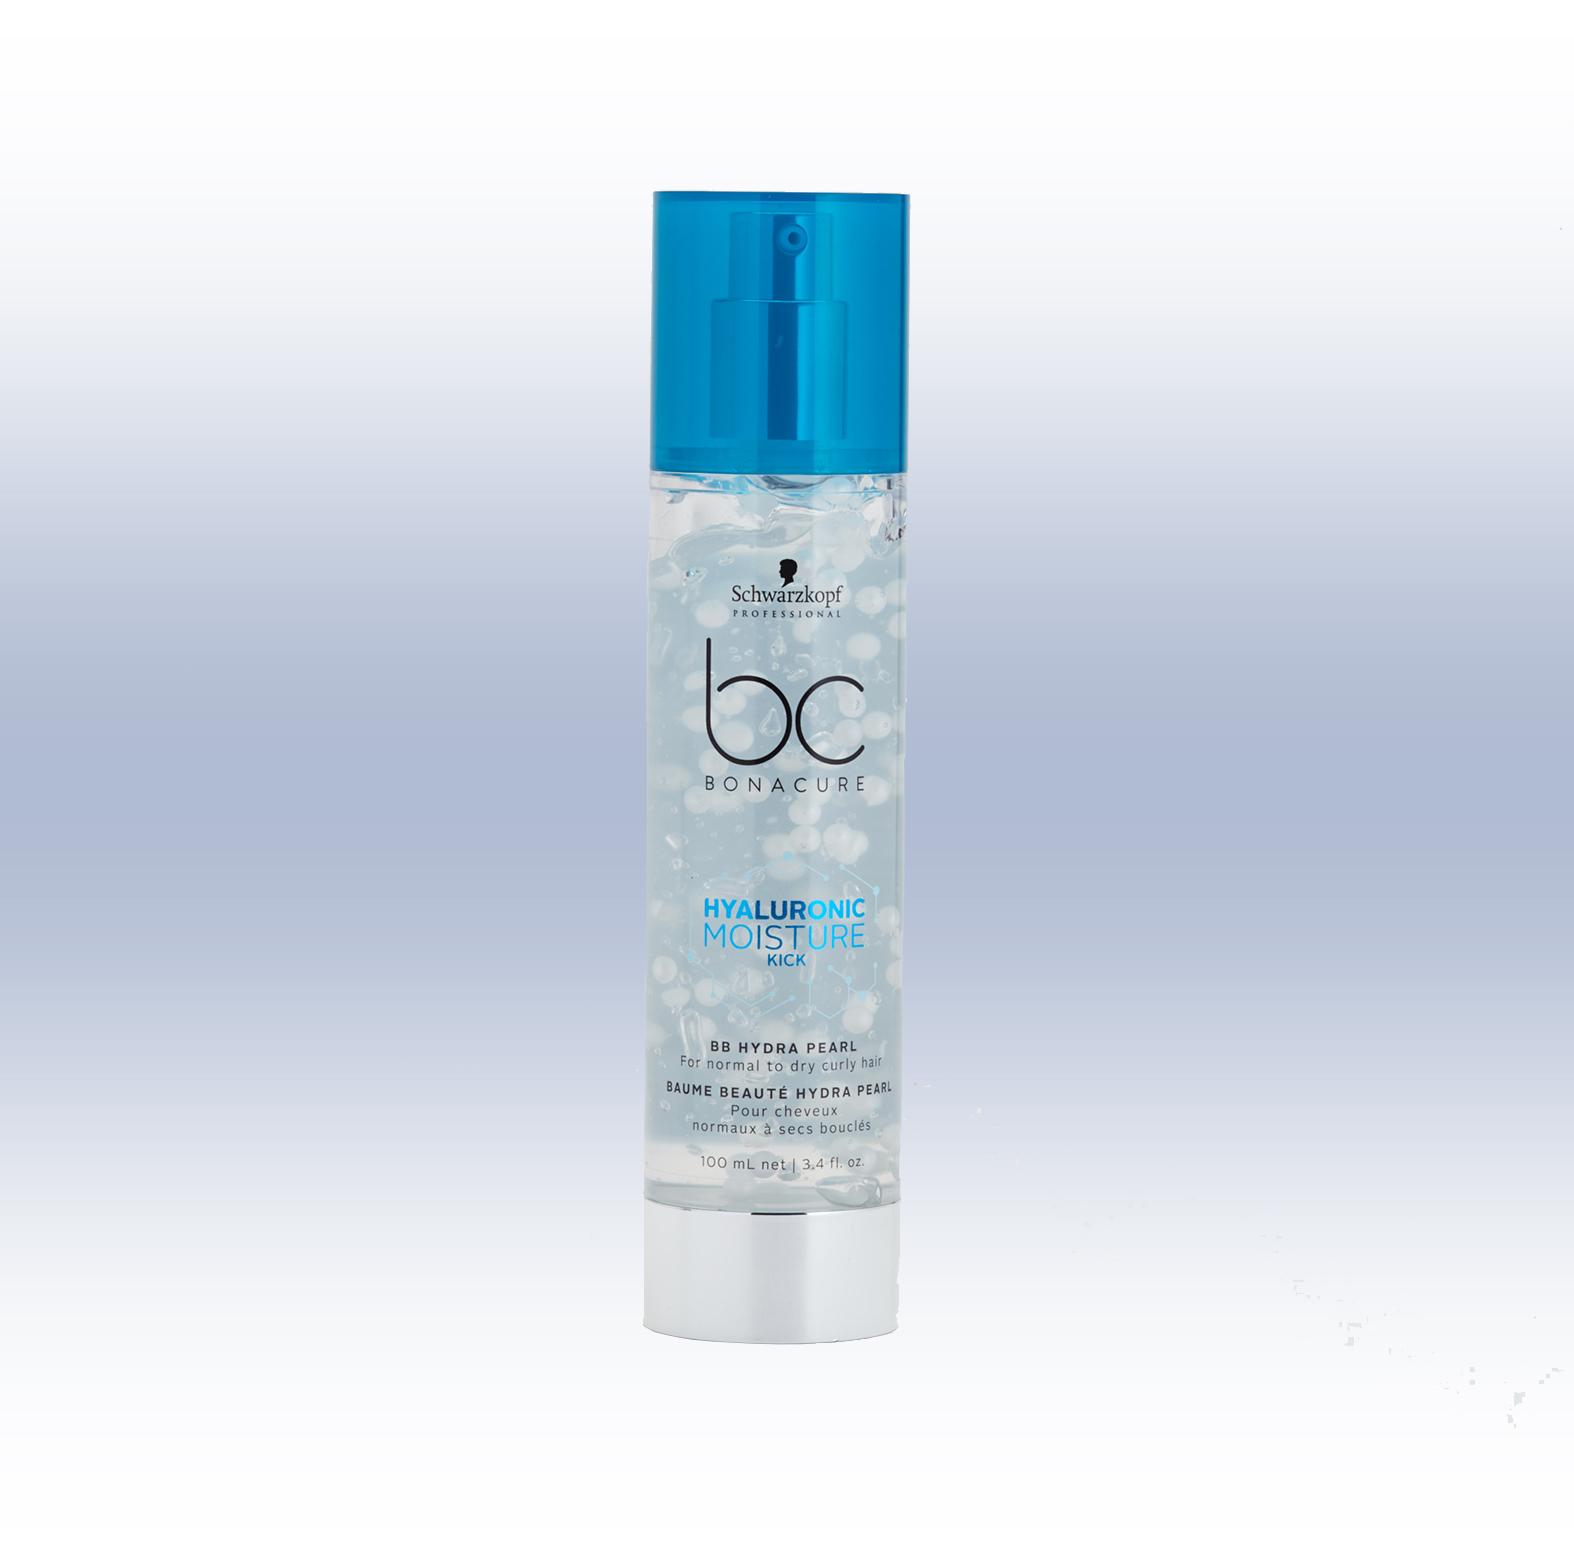 Увлажняющее средство для волос Bonacure Hyaluronic Moisture Kick, Schwarzkopf Professional